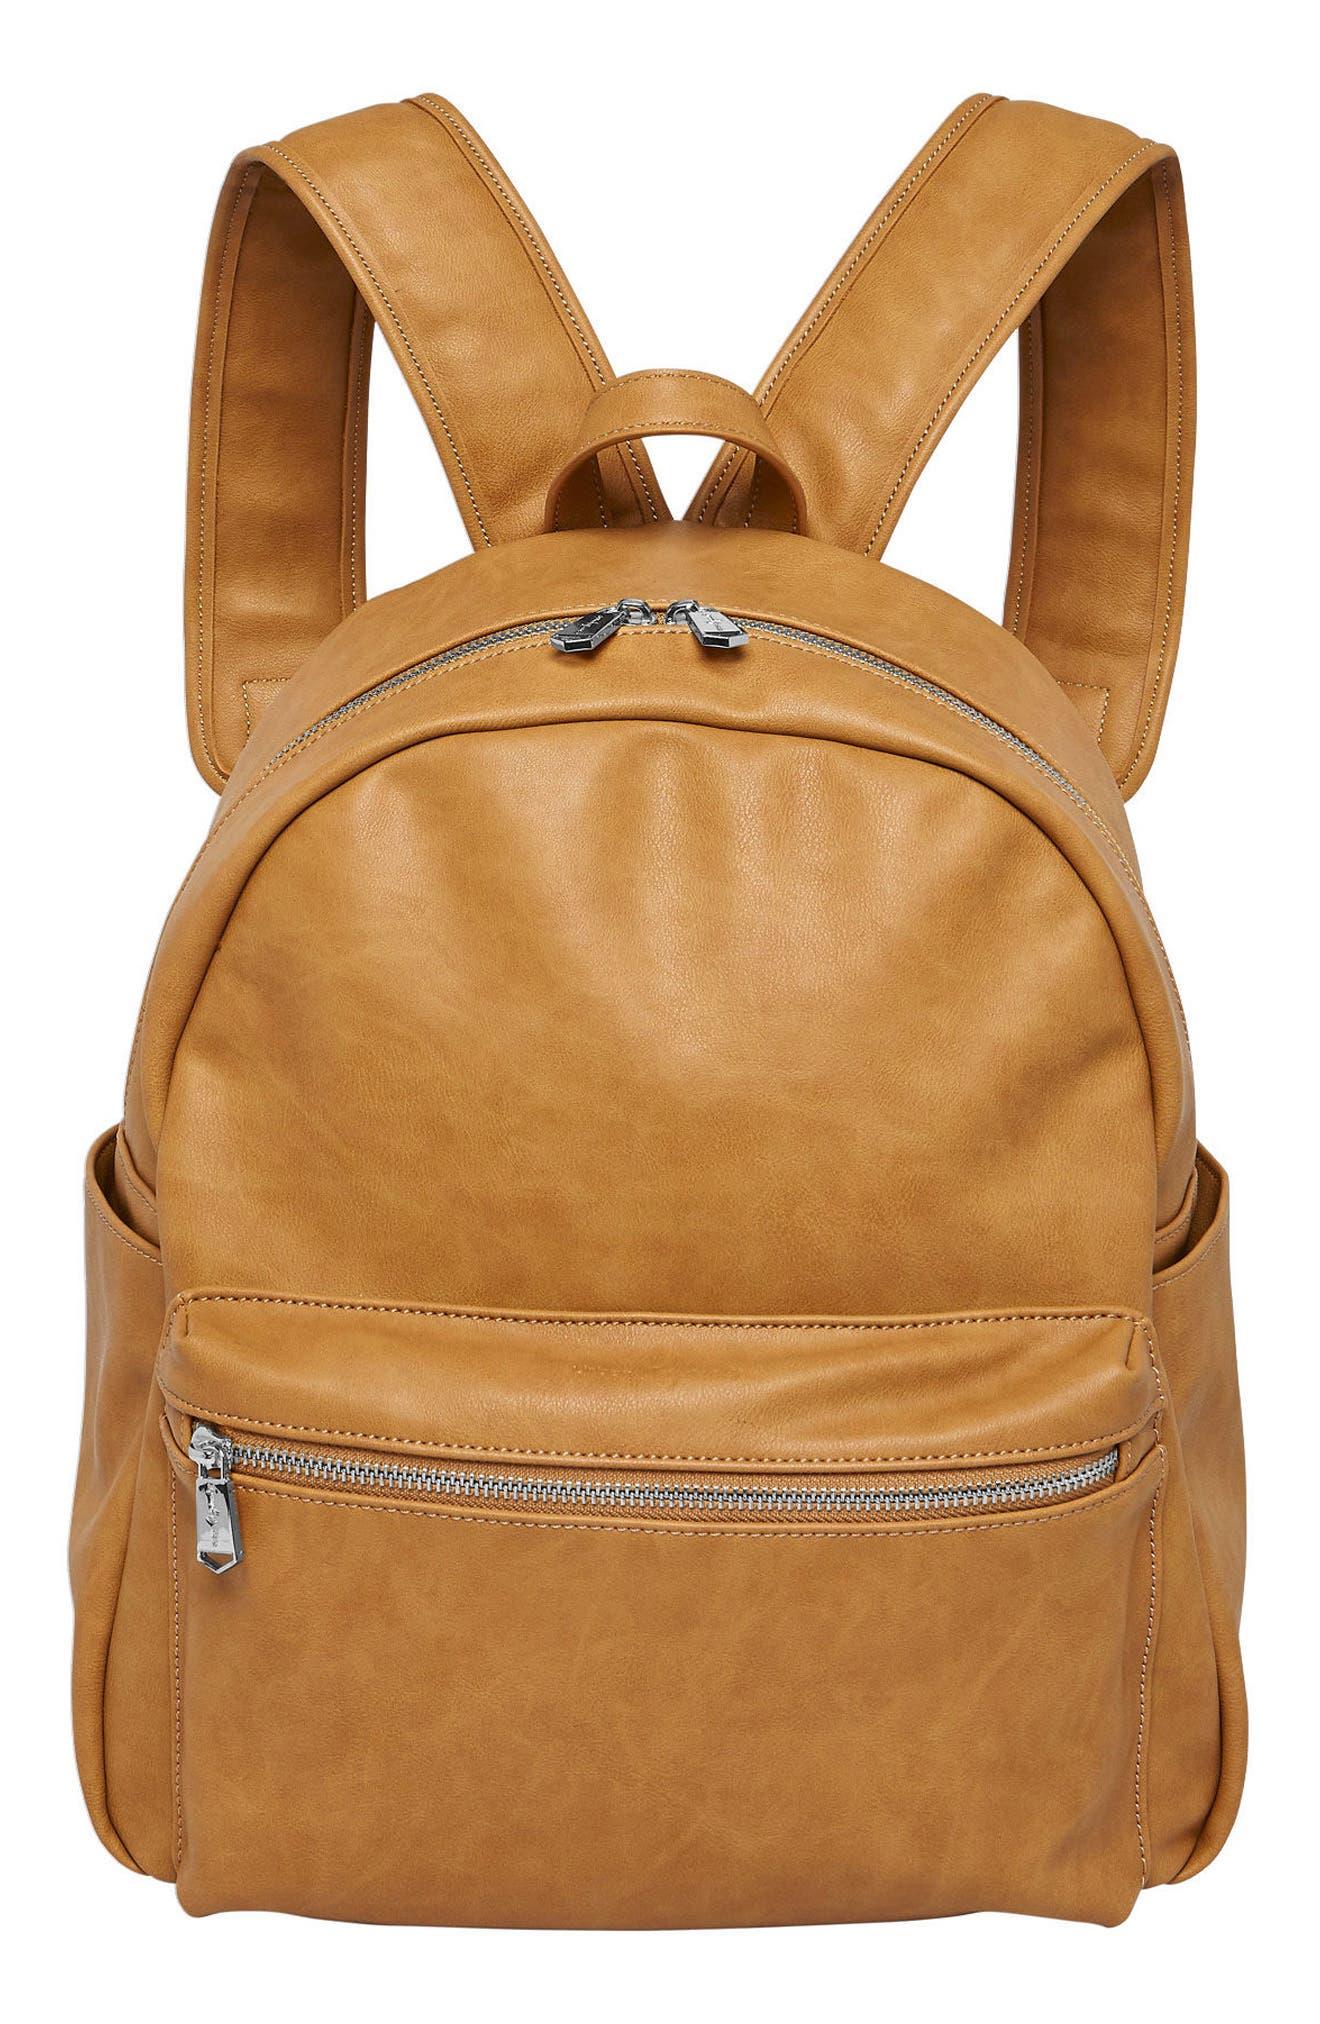 Practical Vegan Leather Backpack,                         Main,                         color, Camel